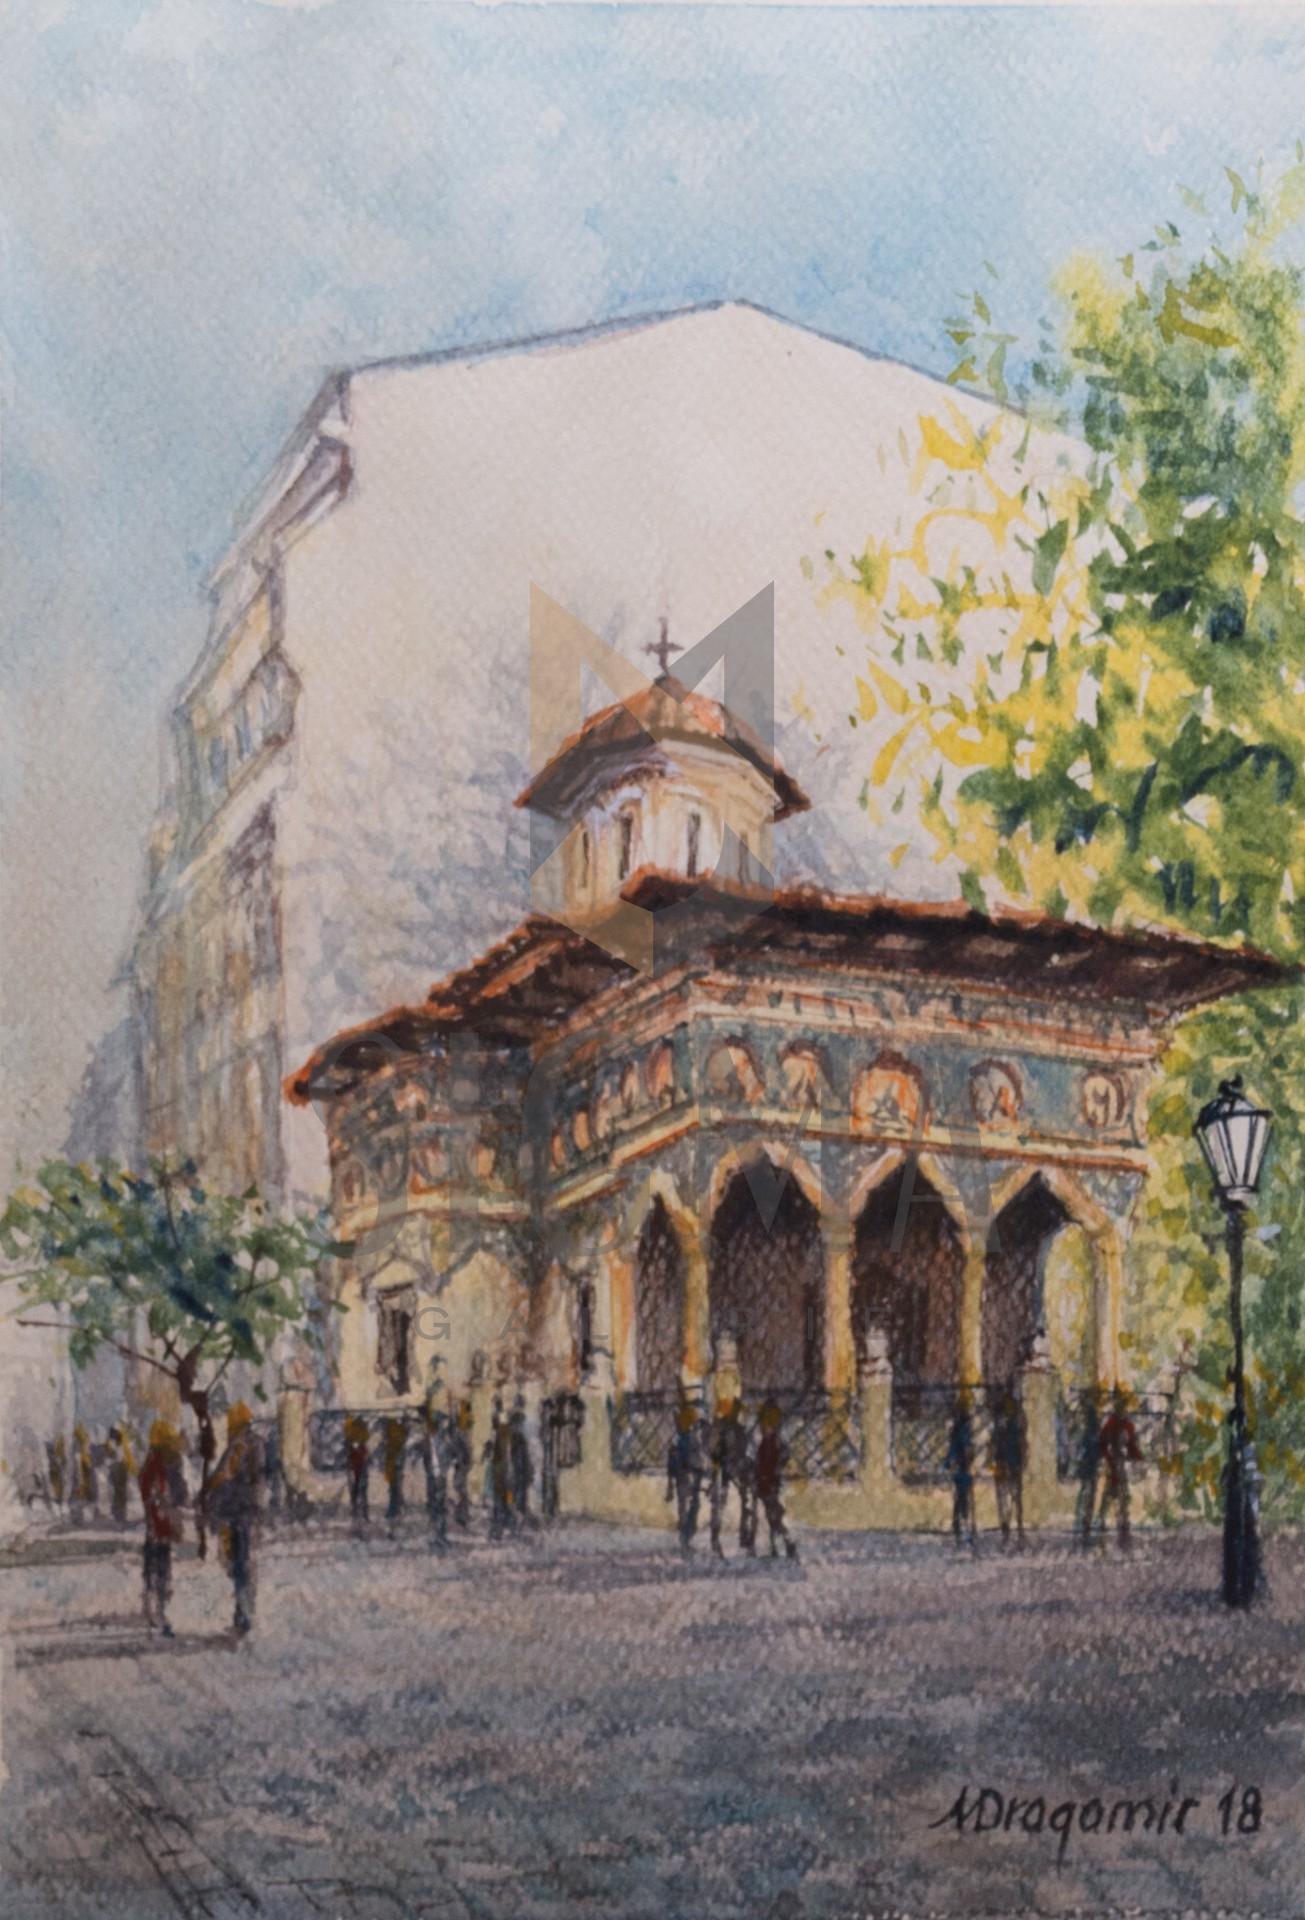 Tablou, Mihaela Dragomir, - Biserica Stavropoleos - acuarela, 28x19,5 cm